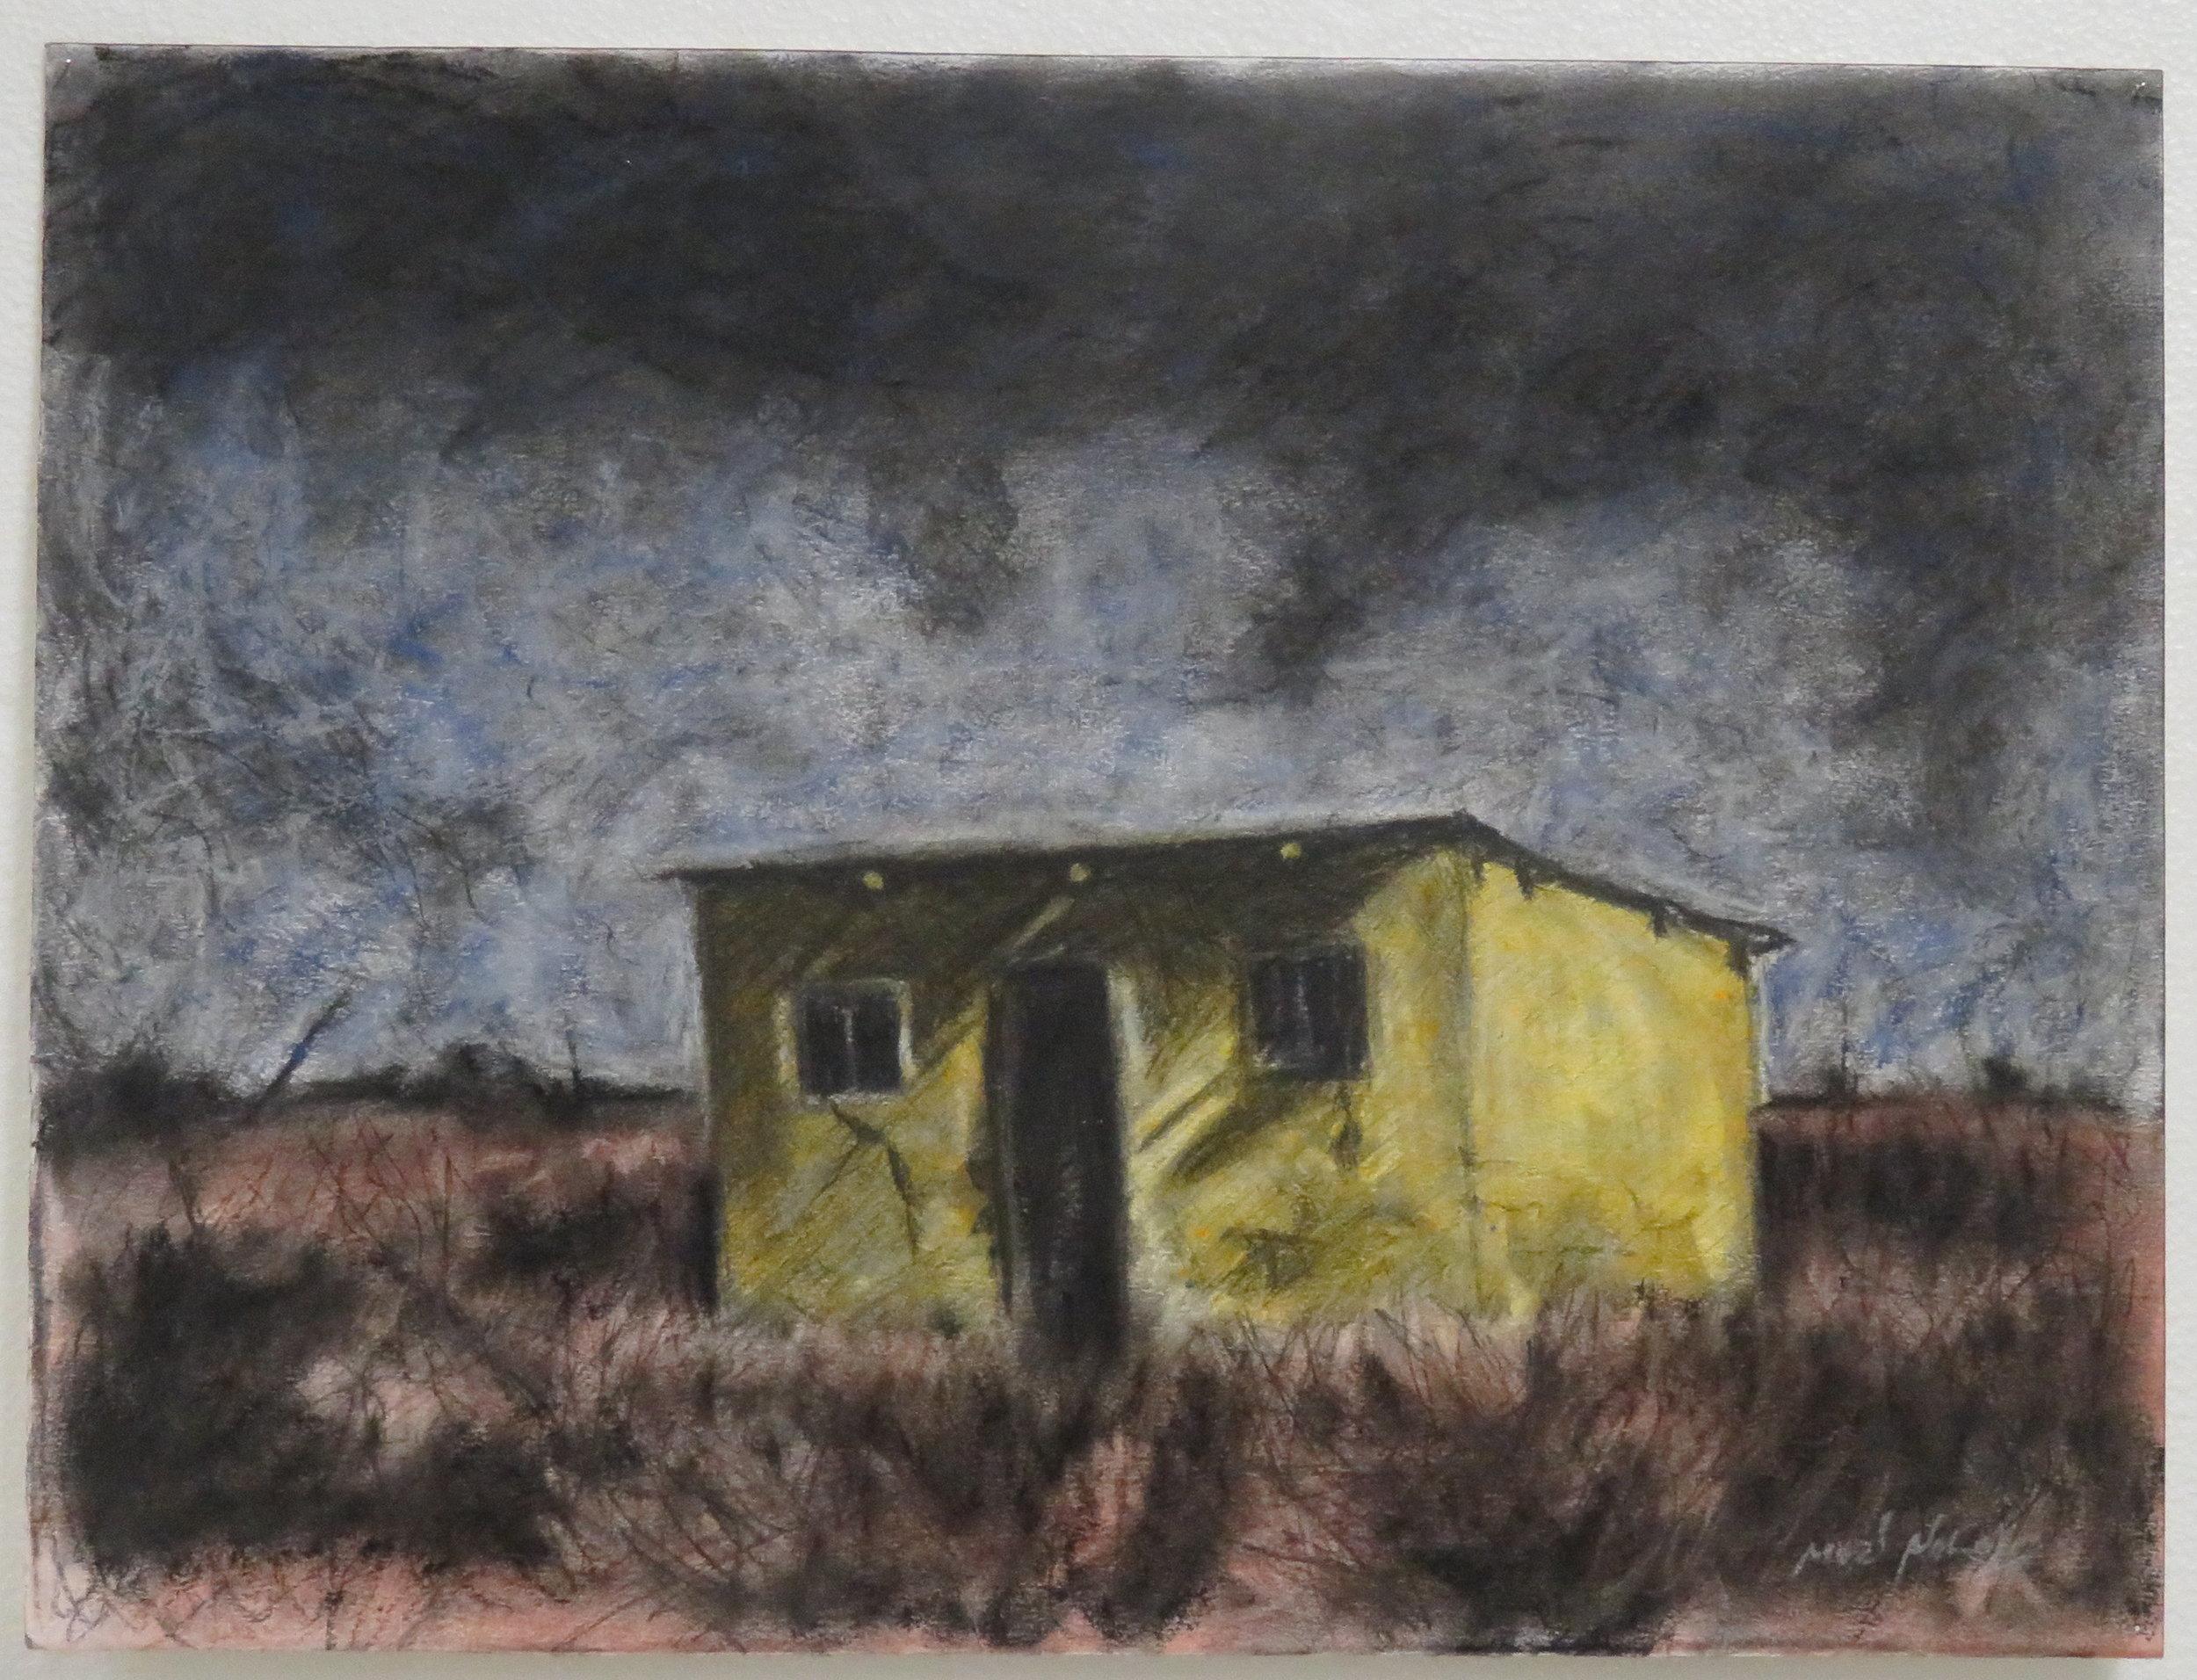 Above: Muzi Ndlela, Haunted Home, pastel on paper